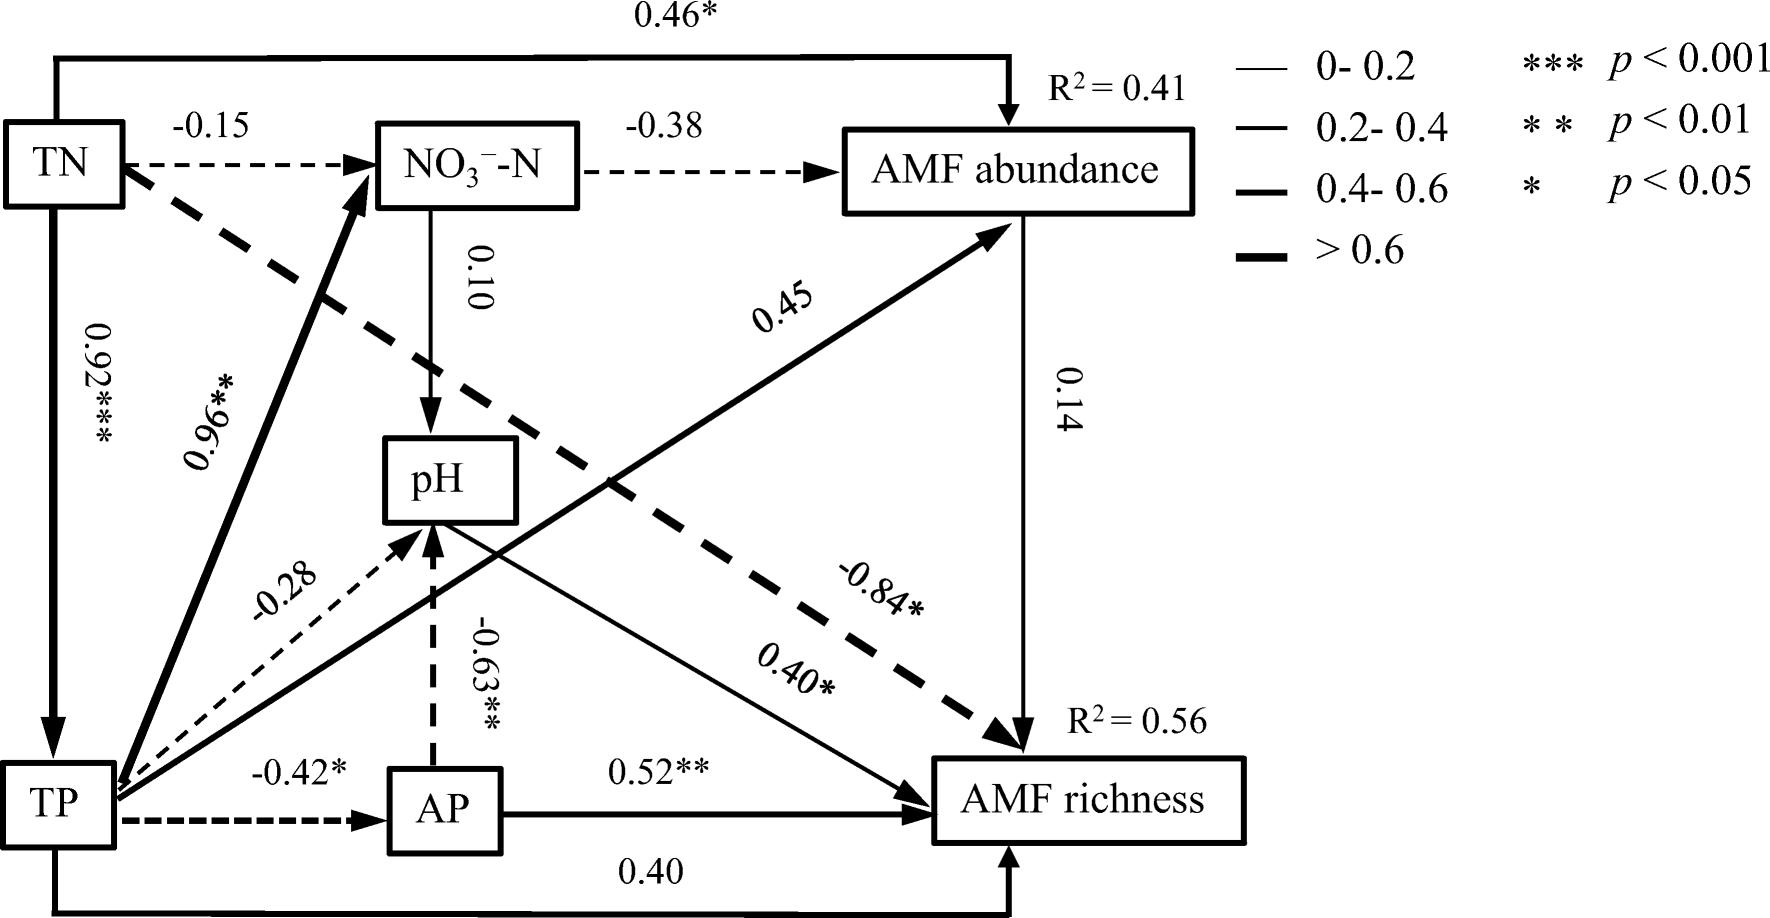 Amf Bz arbuscular mycorrhizal fungi abundance was sensitive to